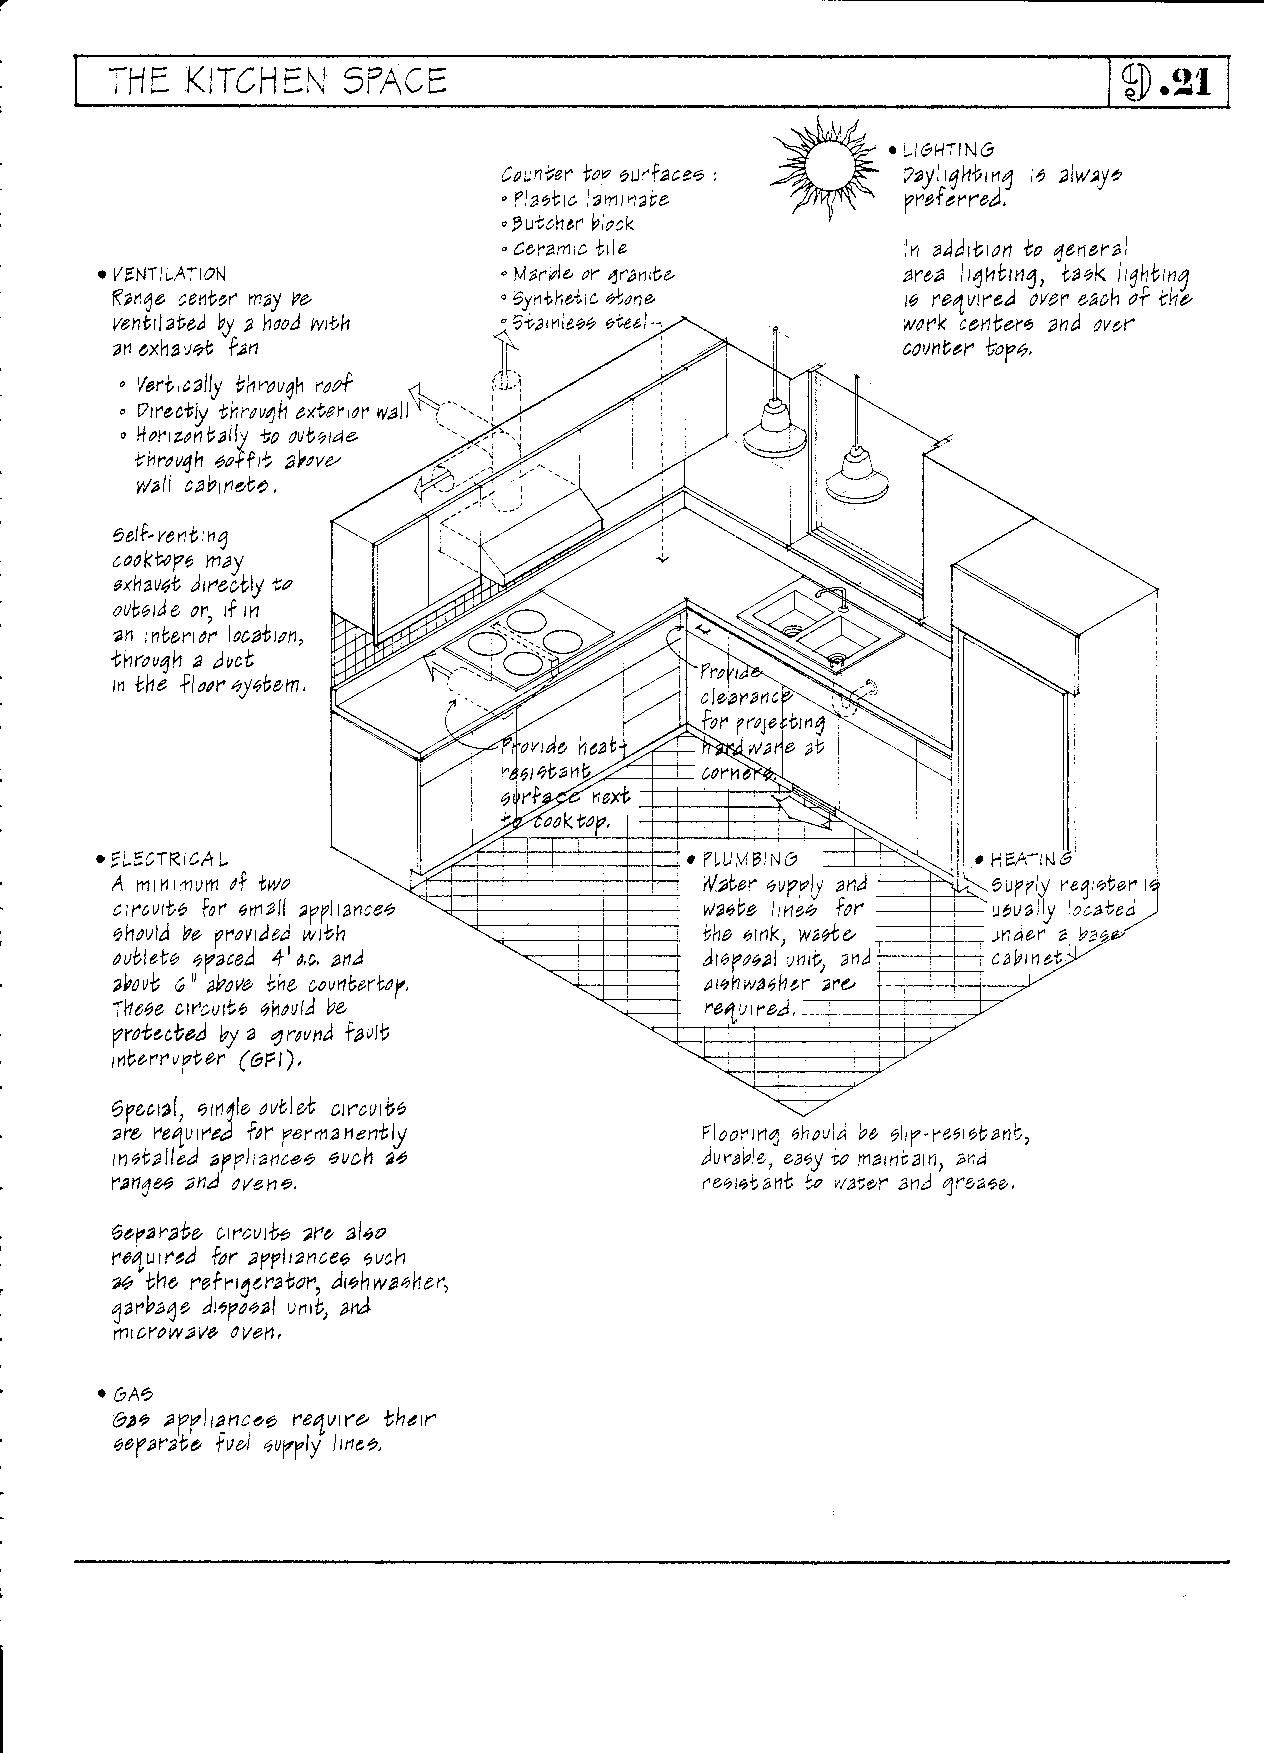 Kitchen measurements - good reference | Reválida, diseño, etc ...